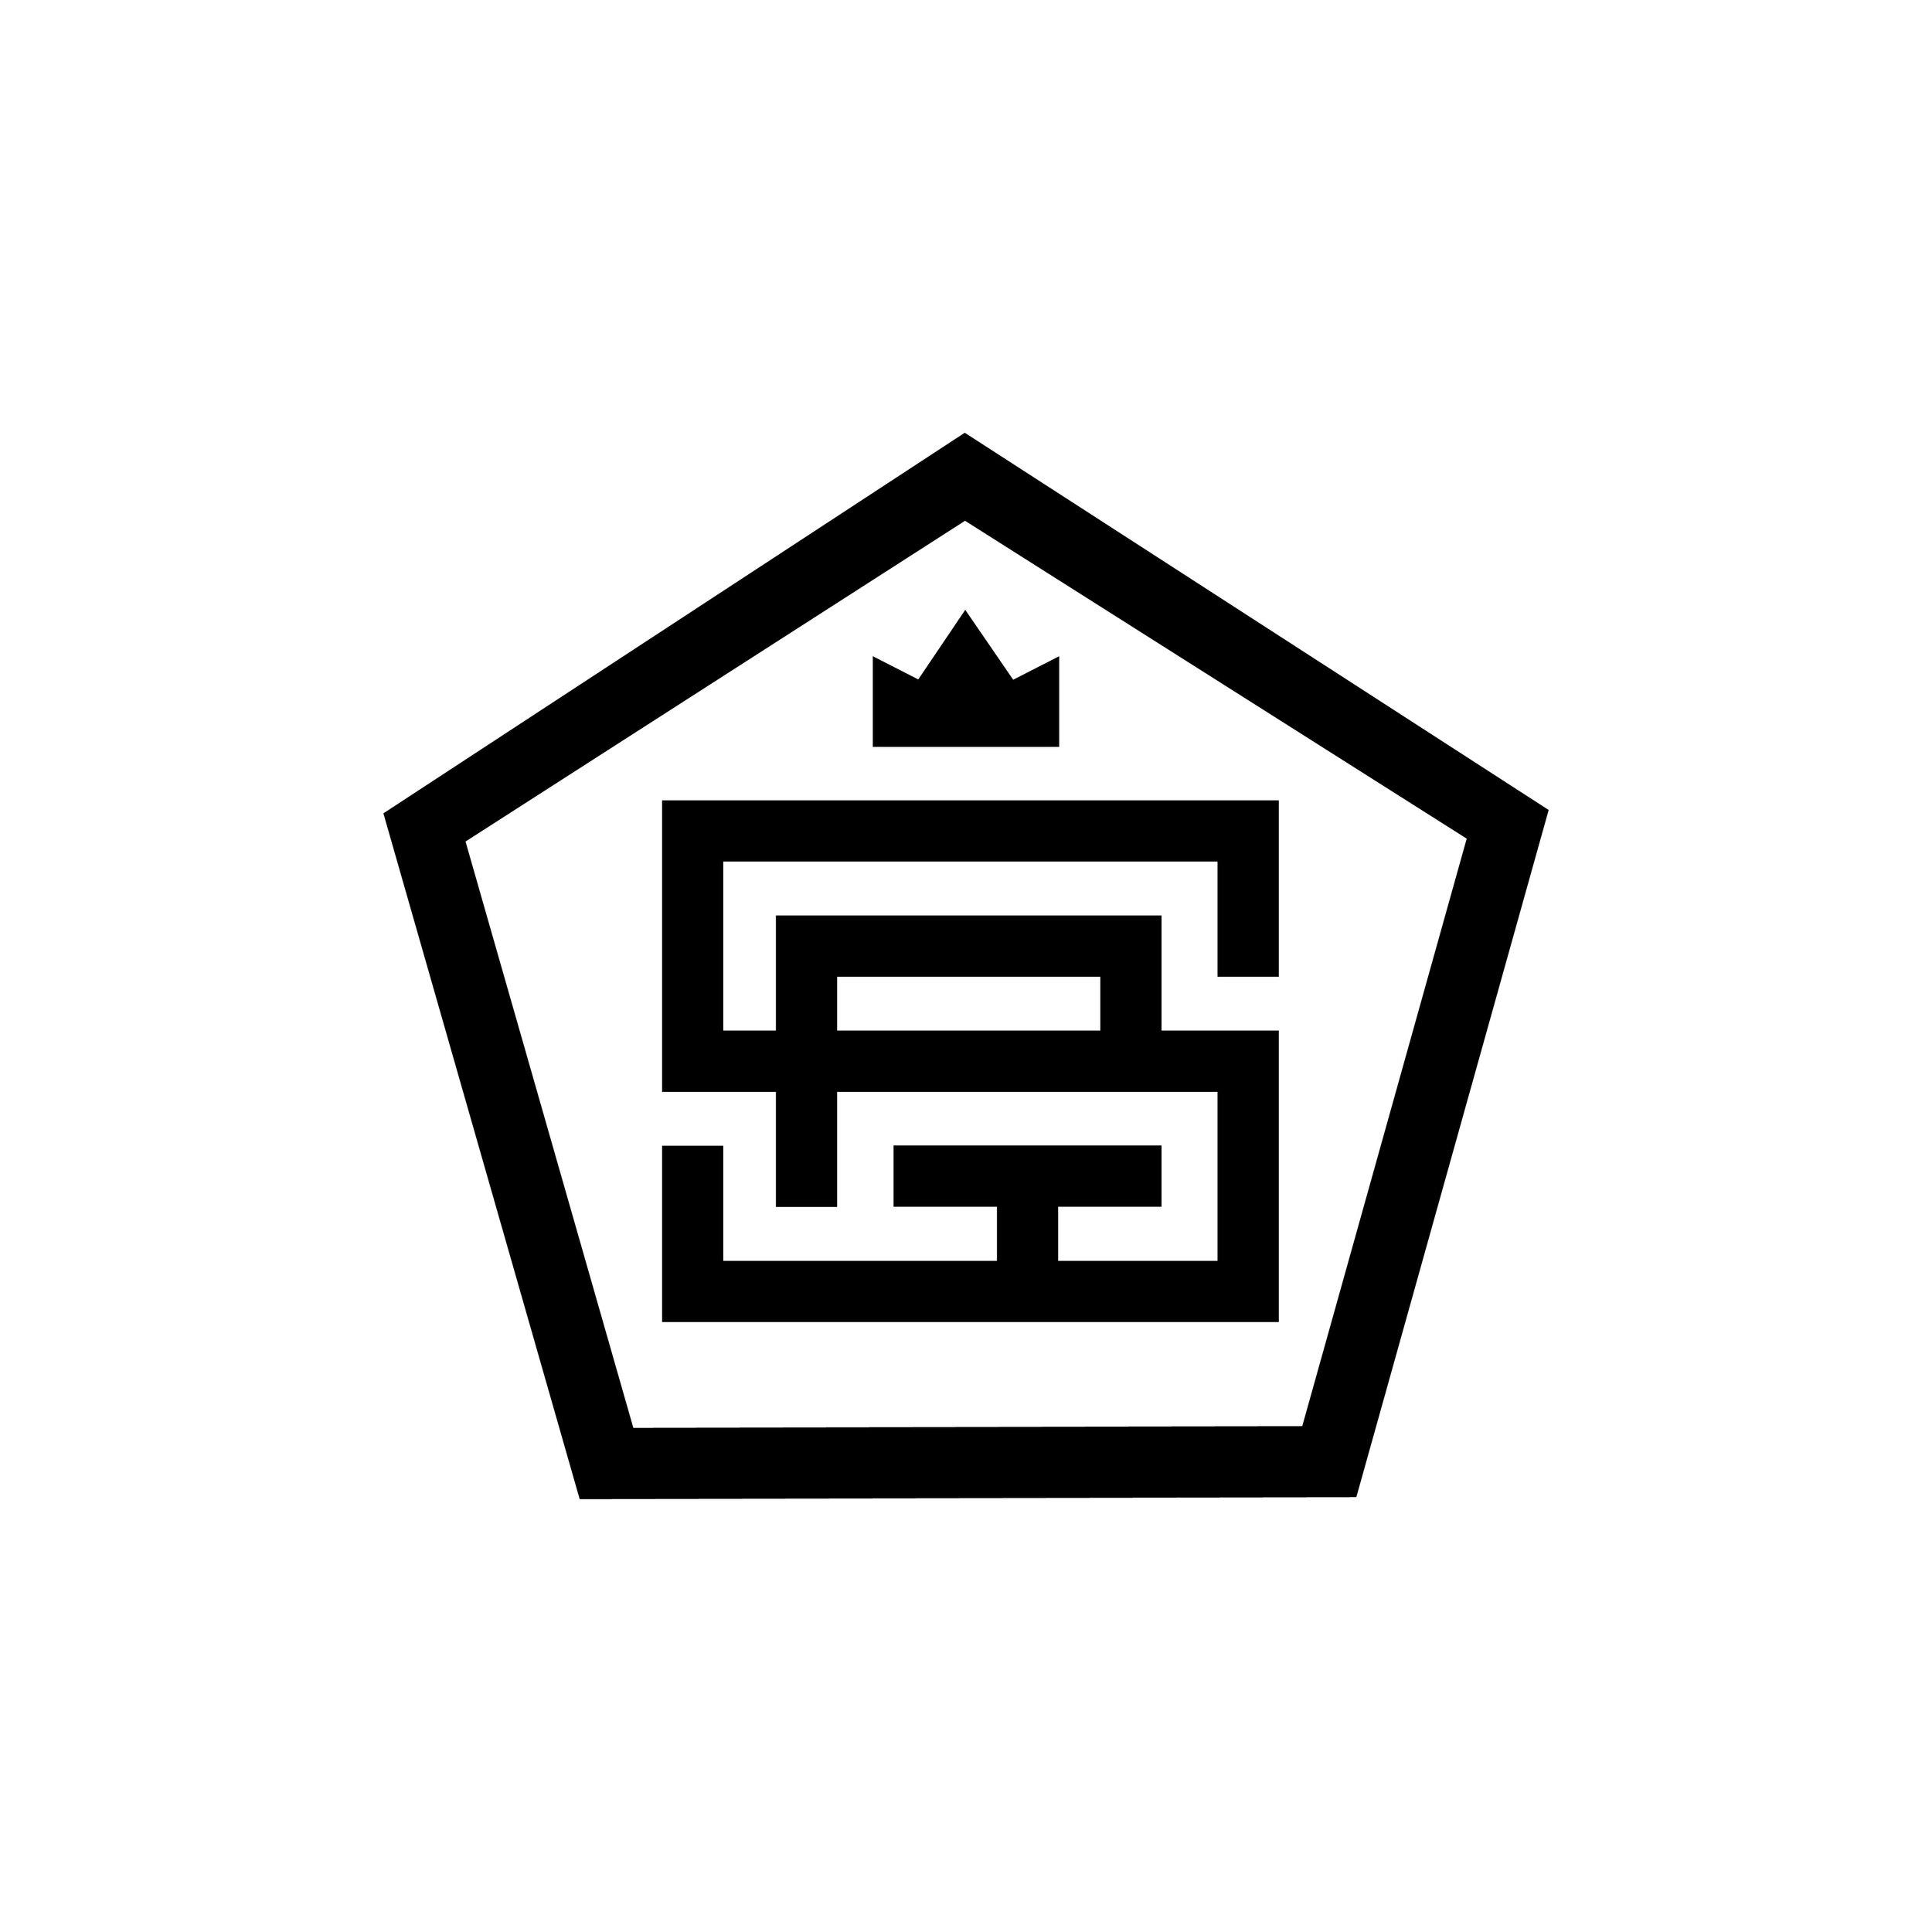 cpmg-logos-april19-18.jpg